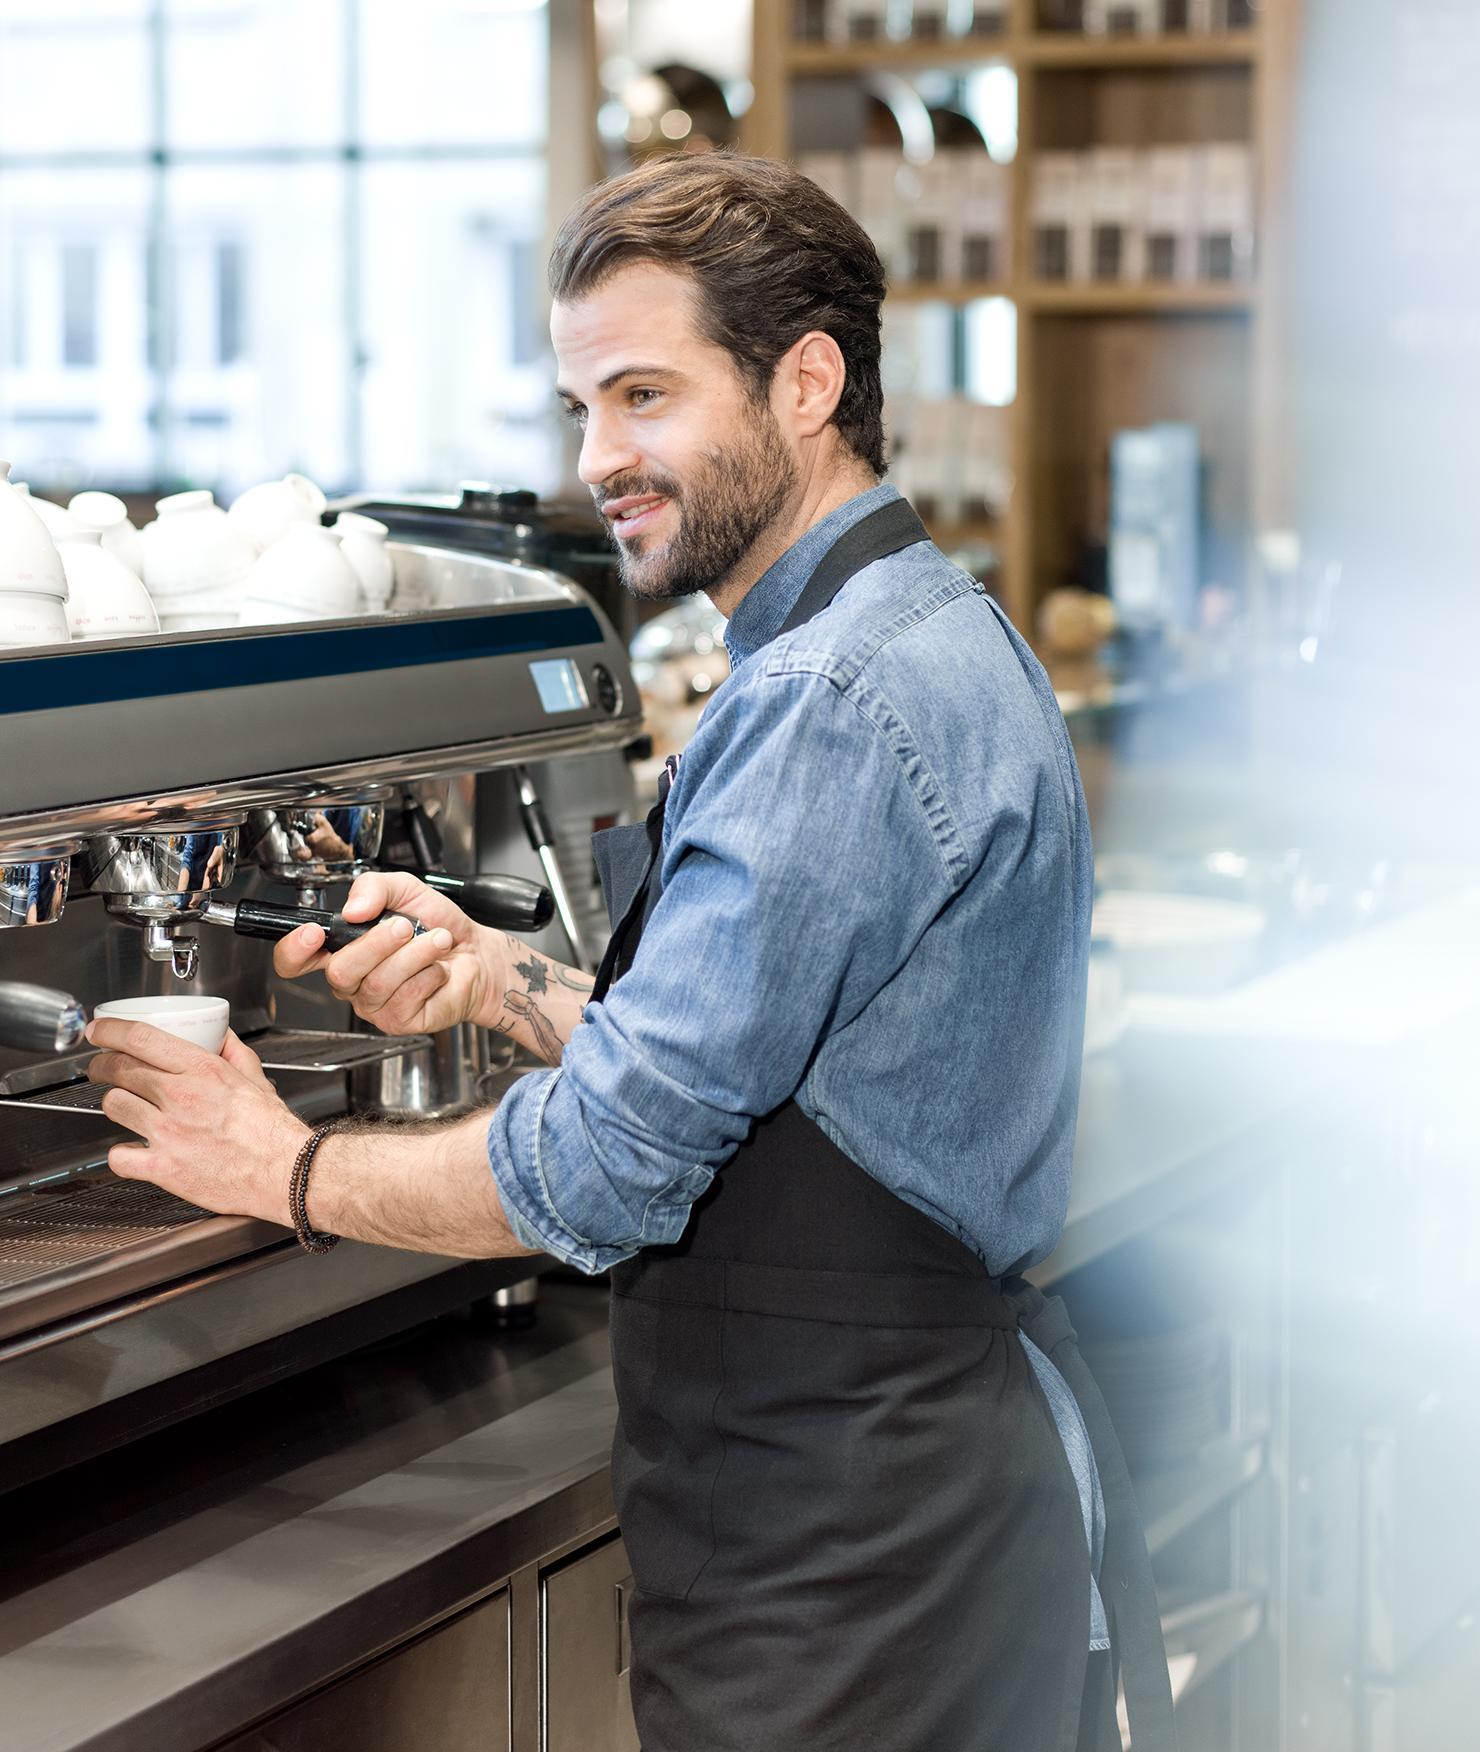 BRITA water coffee shop and bakery barista